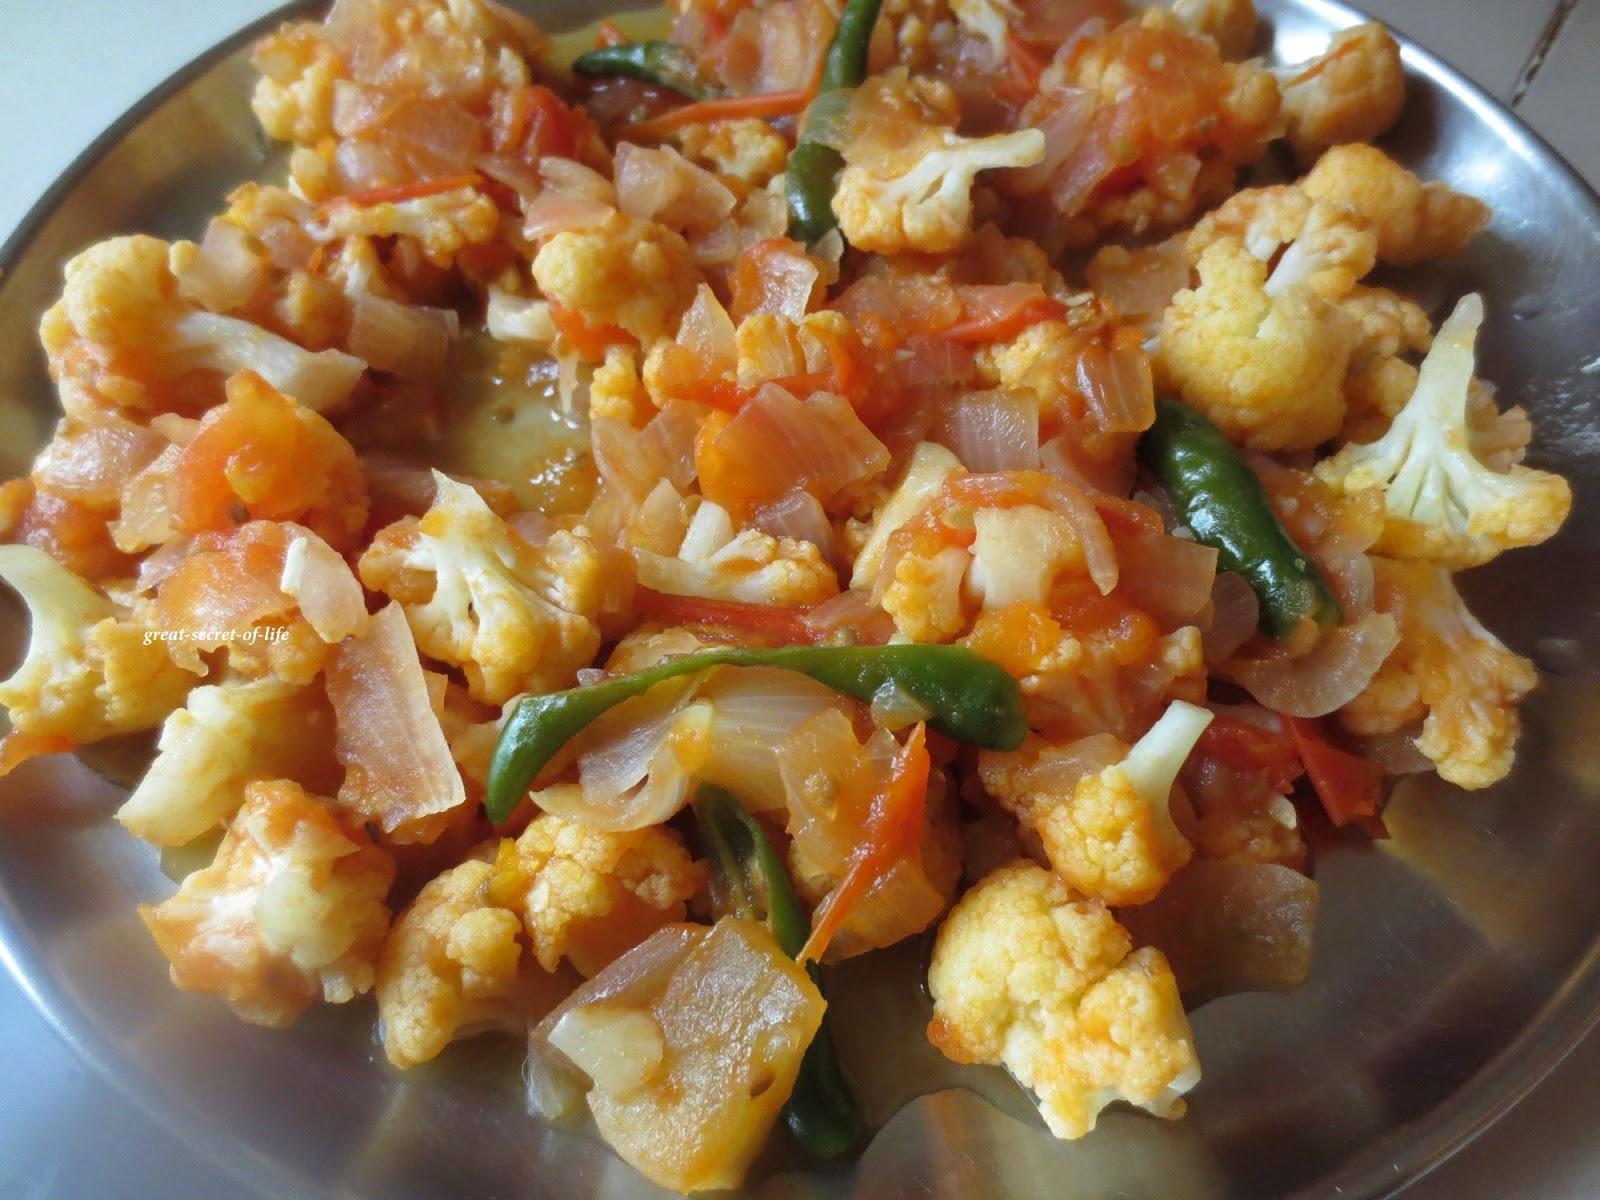 Cauliflower Chutney| Great-secret-of-life